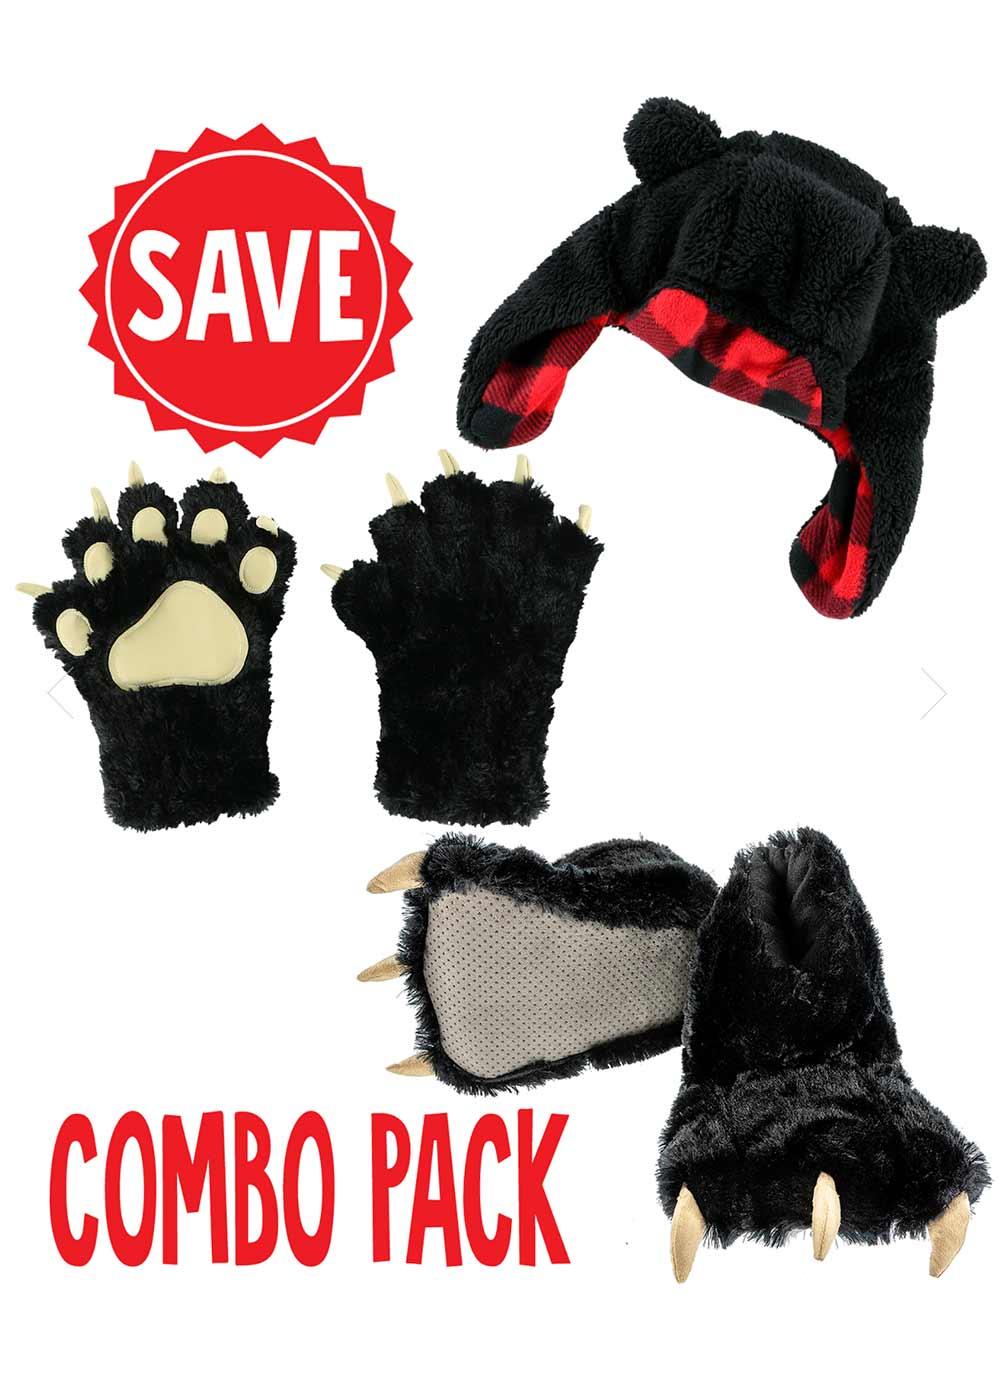 Link to https://www.lazyone.com/animal-paw-slippers